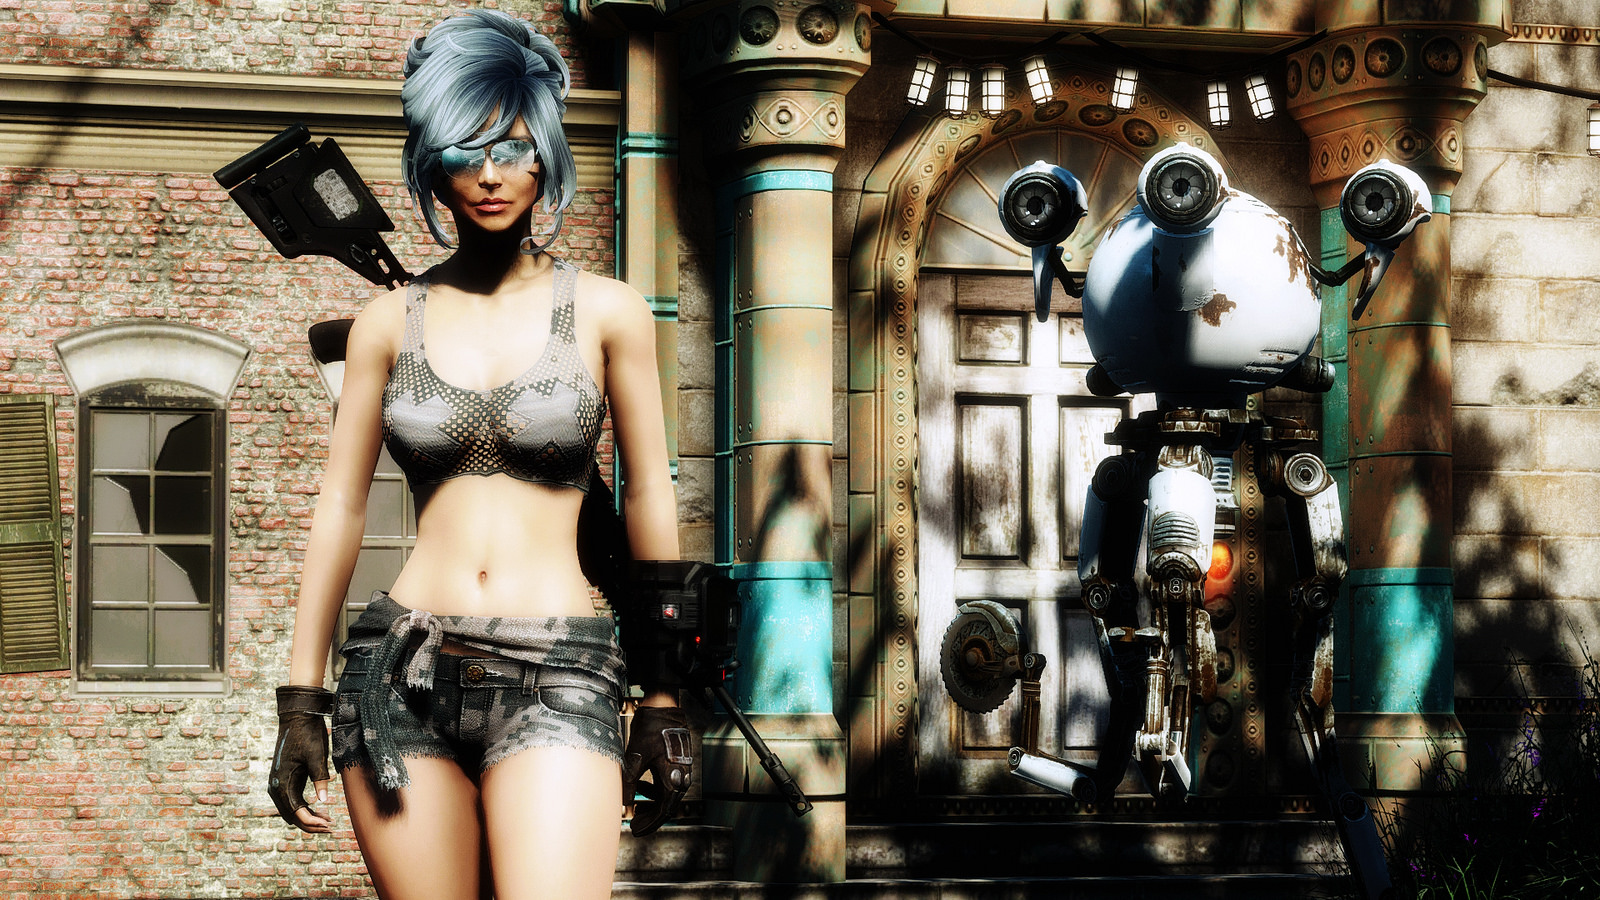 30319770684_e85c022802_h.jpg - Fallout 4